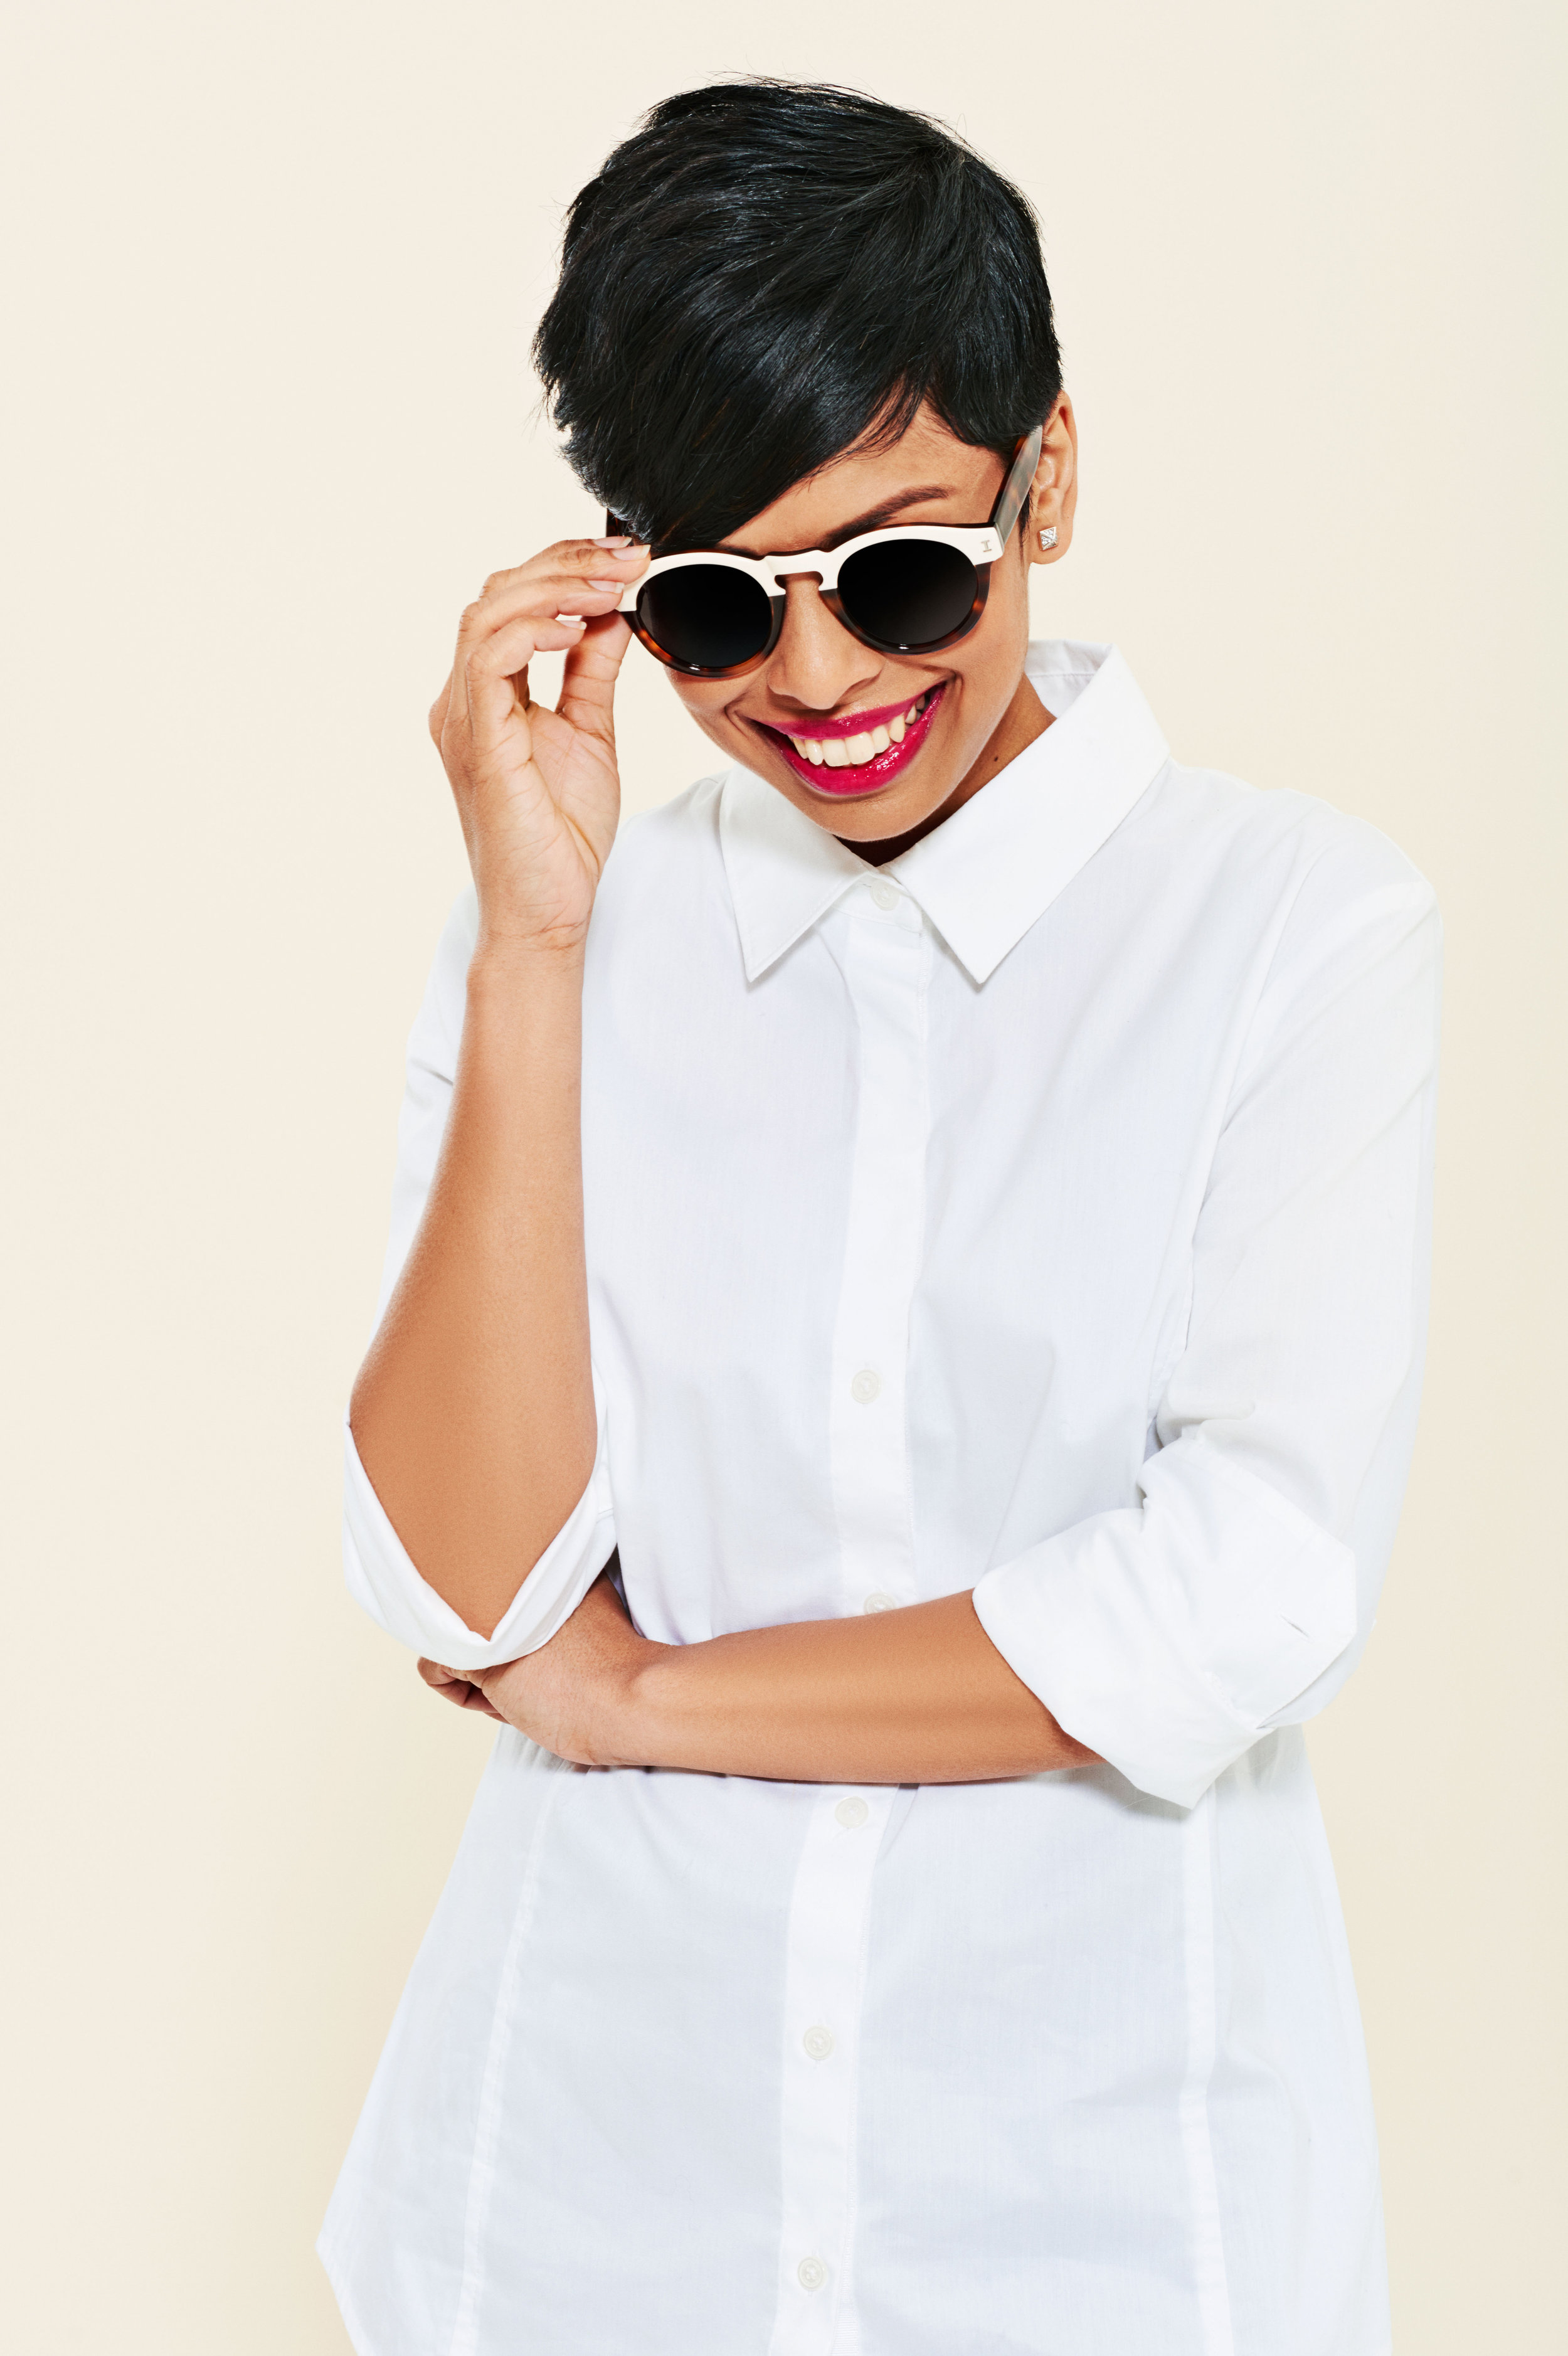 sunglasses-lipsticks-04.w4500.h6760.jpg